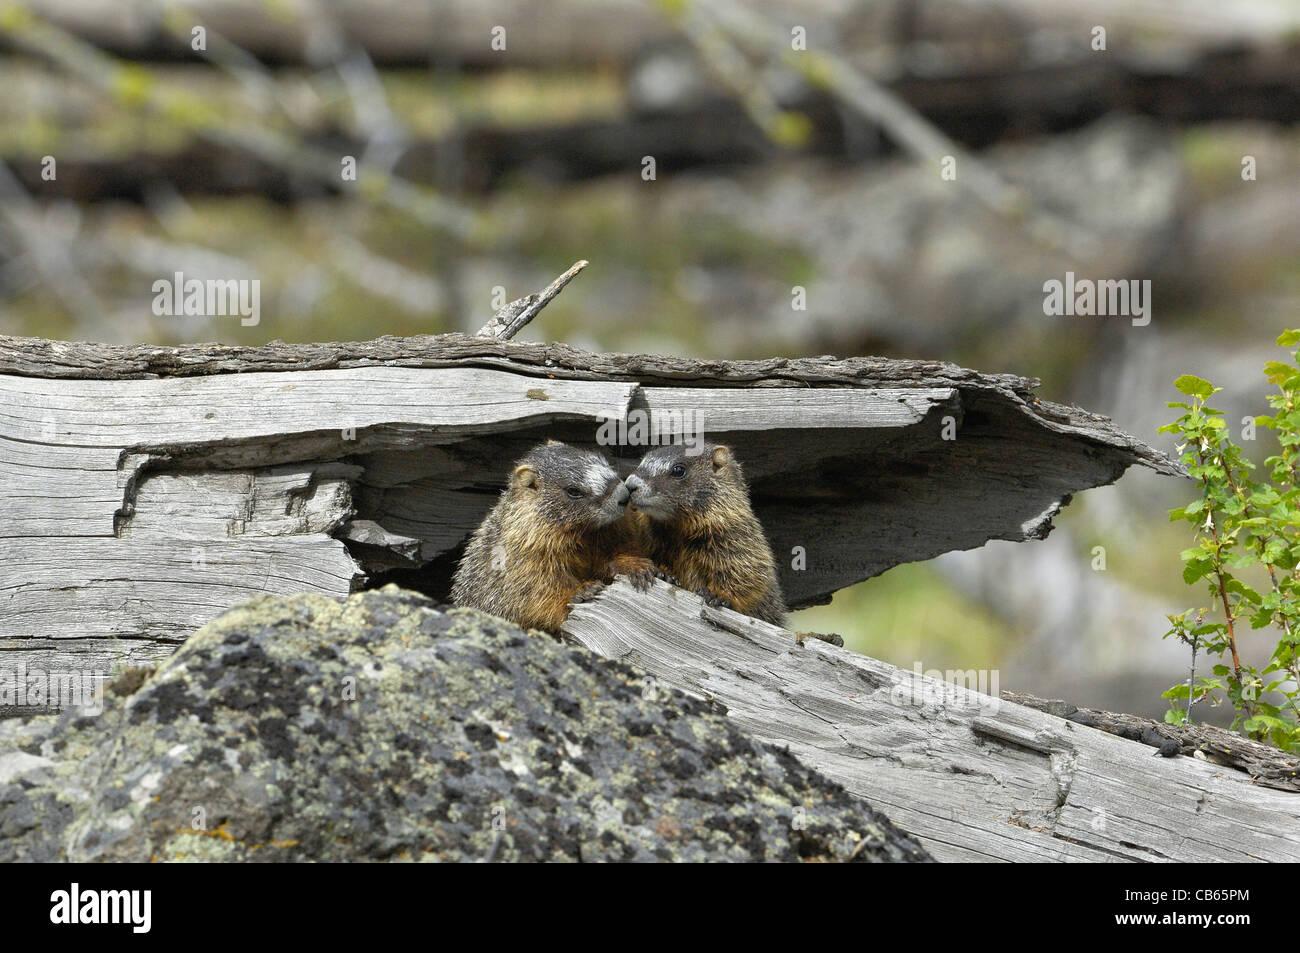 Yellow-bellied Marmot babies kissing. - Stock Image